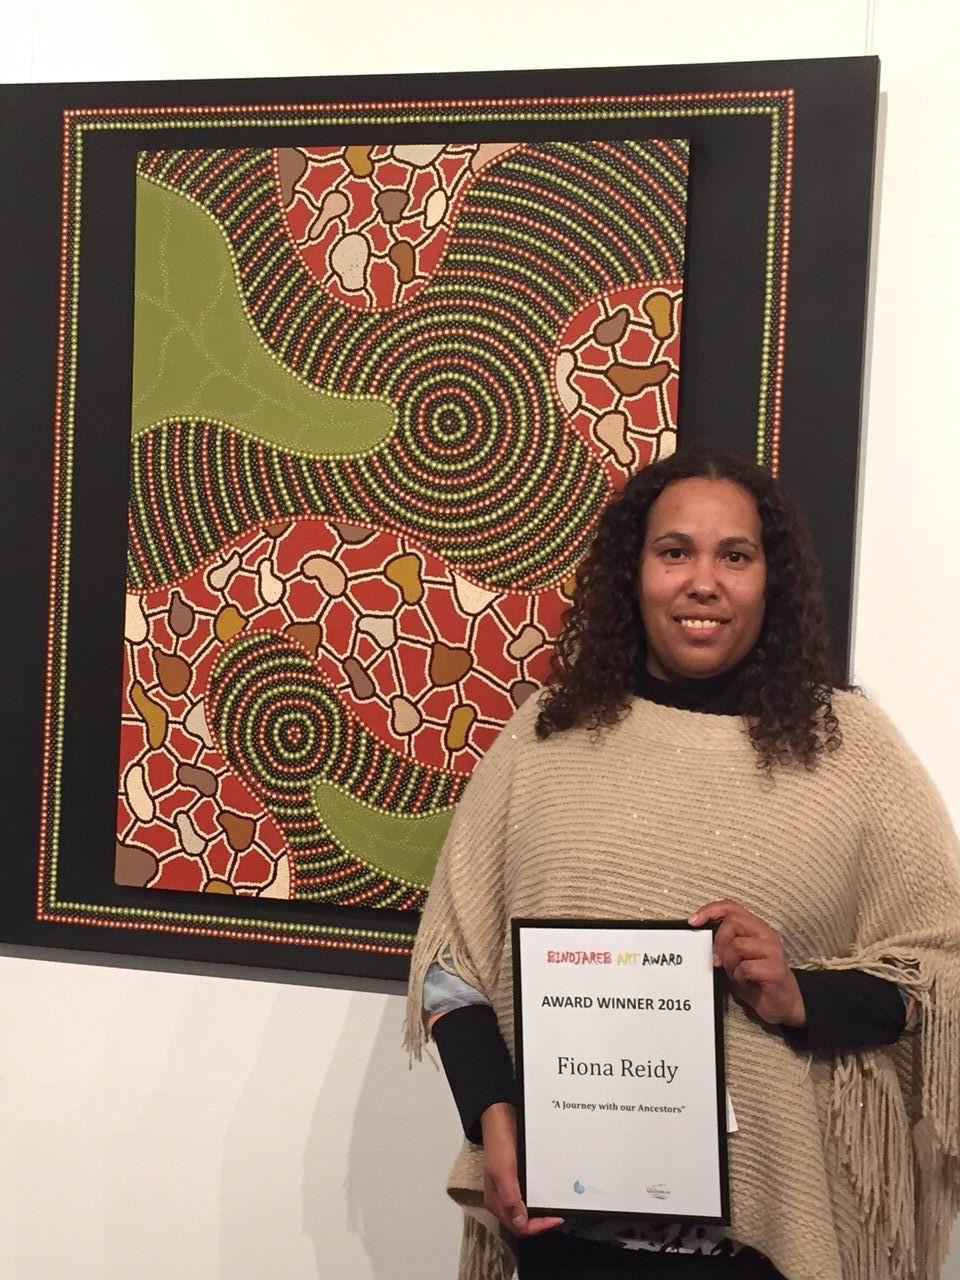 Fiona Reidy won the $10,000 Binjareb Art Award